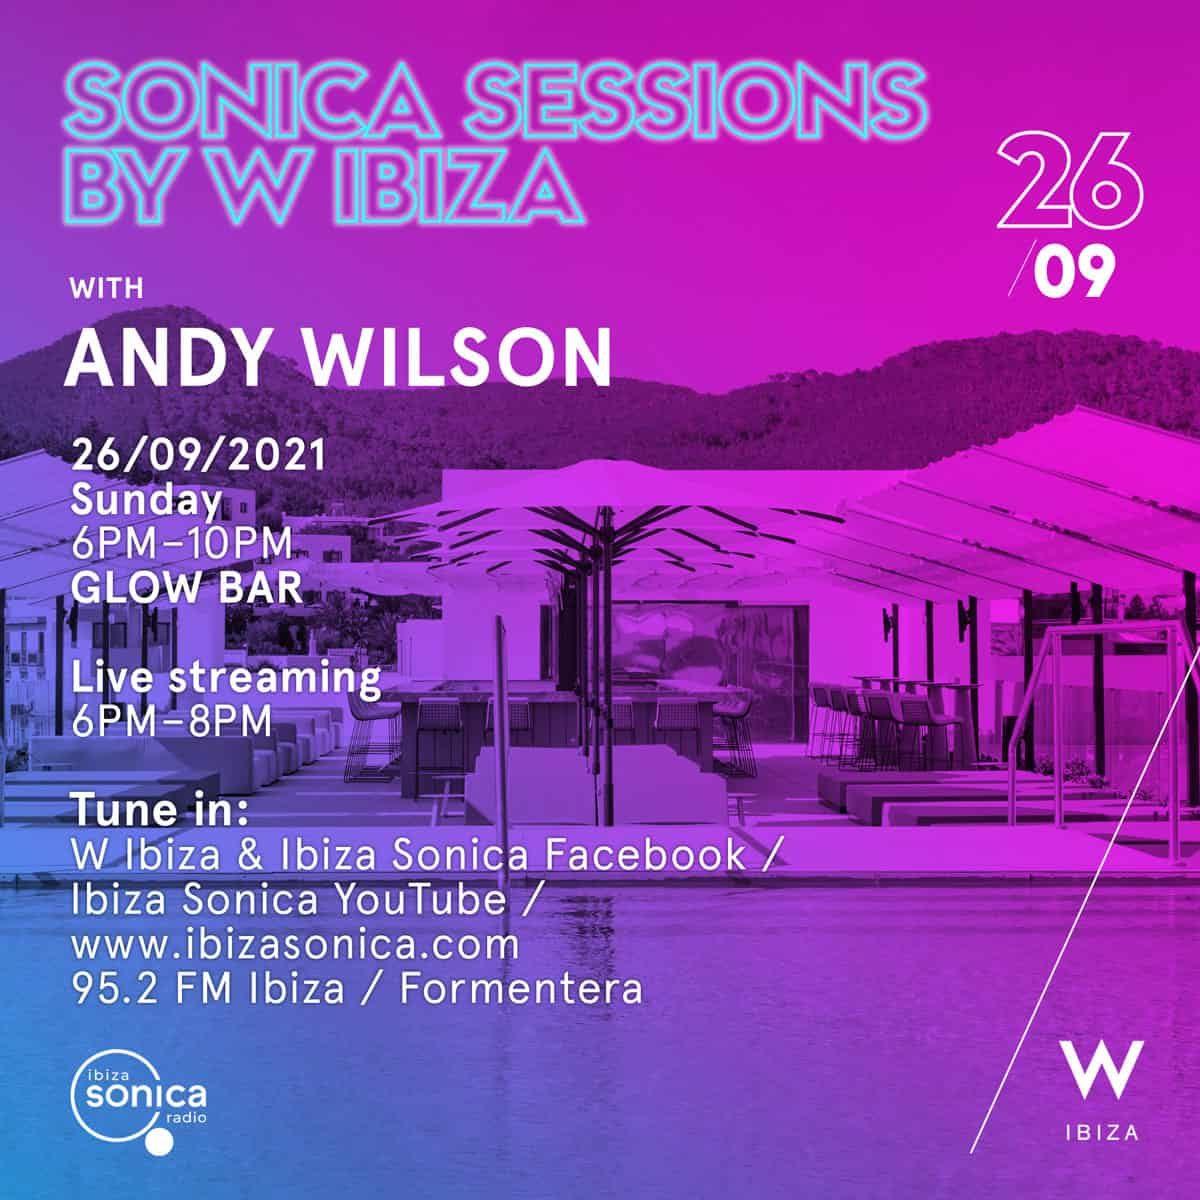 sonica-sessions-w-ibiza-2021-andy-wilson-welcometoibiza